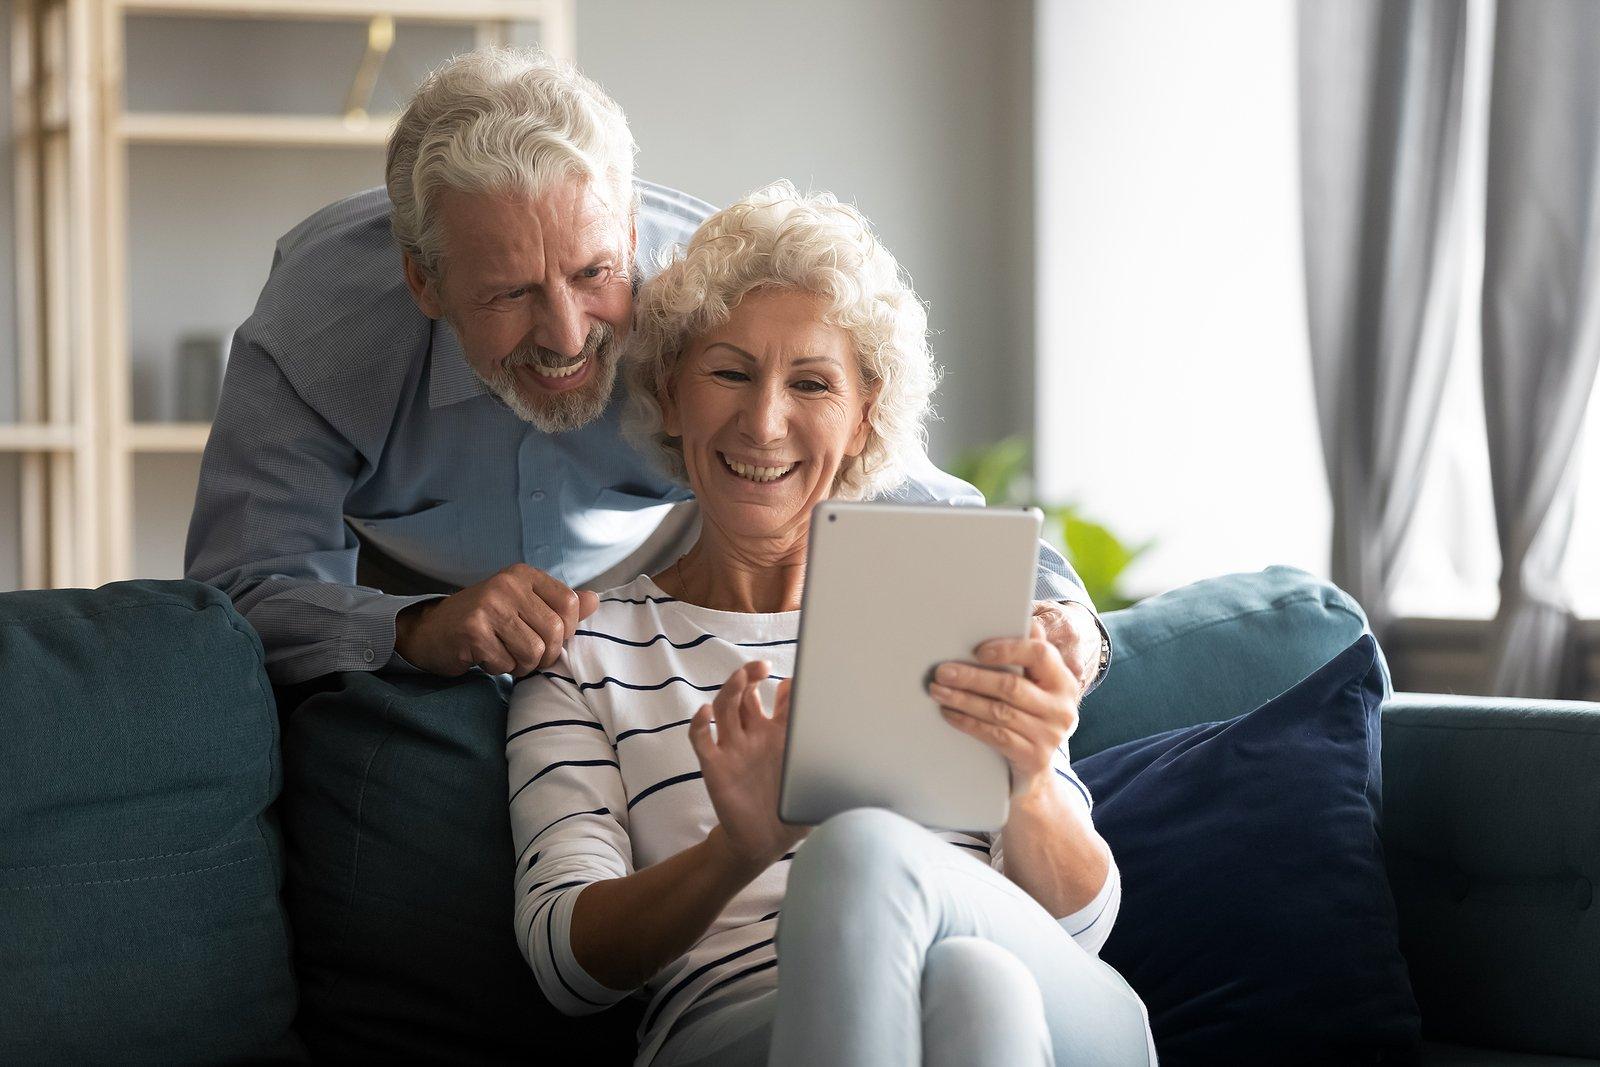 bigstock-Happy-Older-Couple-Using-Compu-360928888